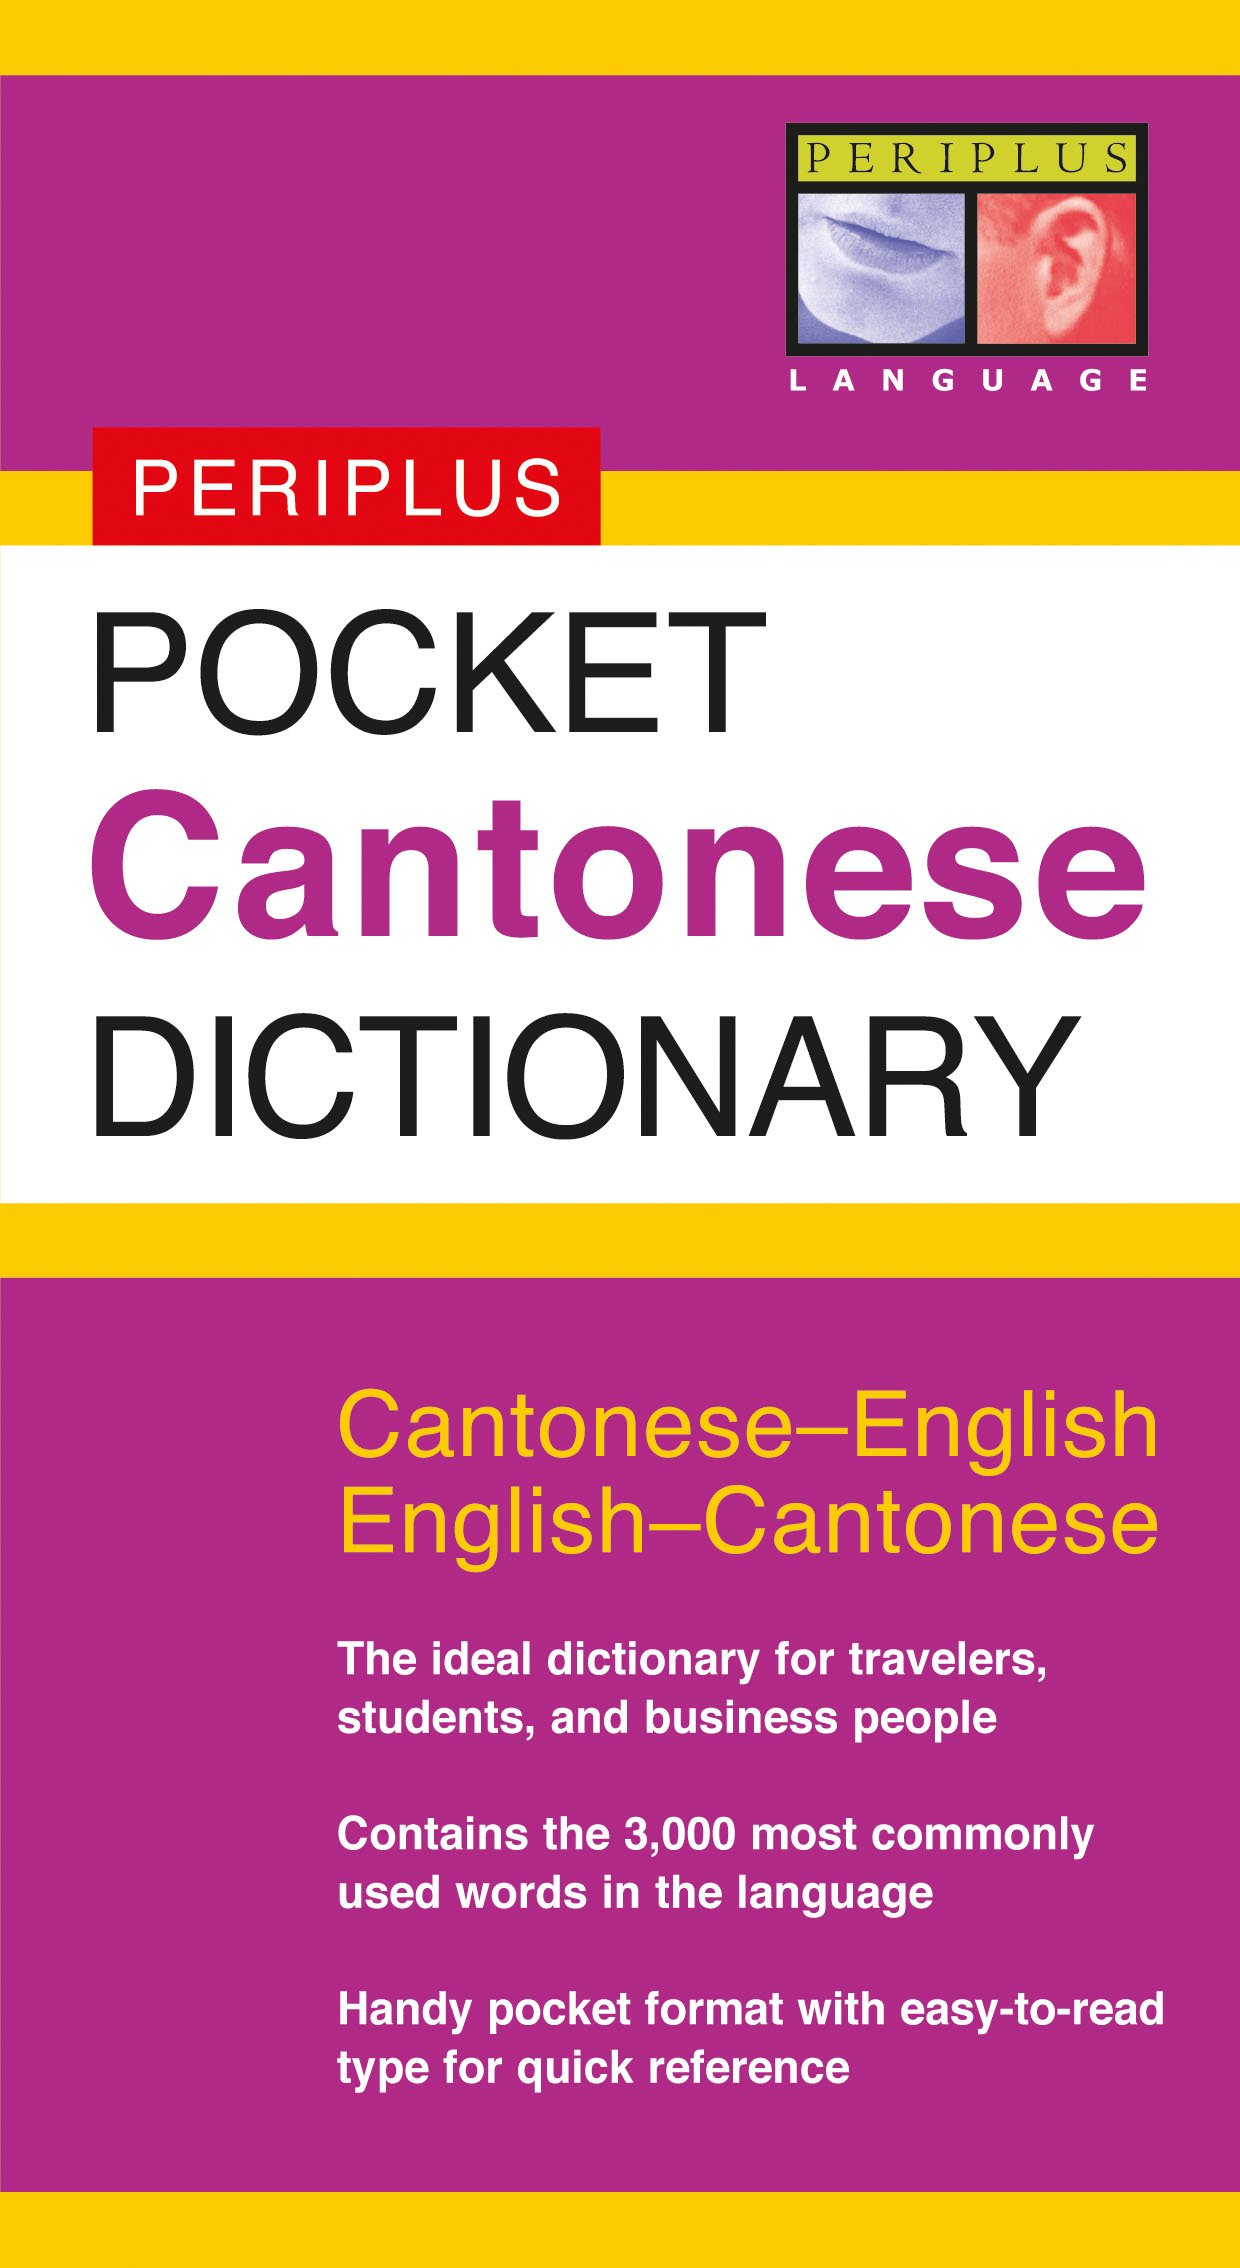 Pocket Cantonese Dictionary: Cantonese-English English-Cantonese (Periplus Pocket Dictionaries)